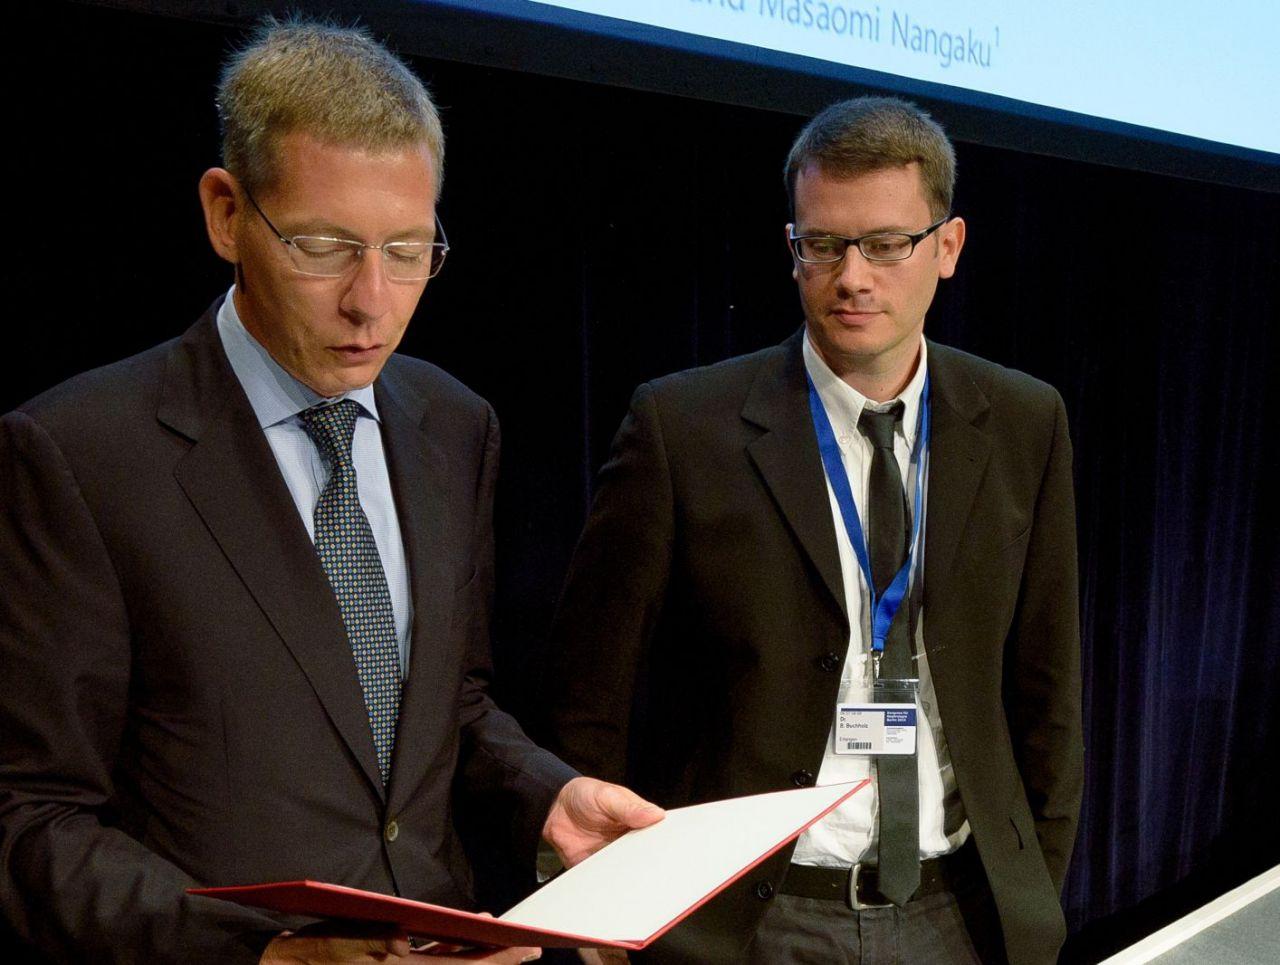 Björn Buchholz nachlese kongress für nephrologie 2014